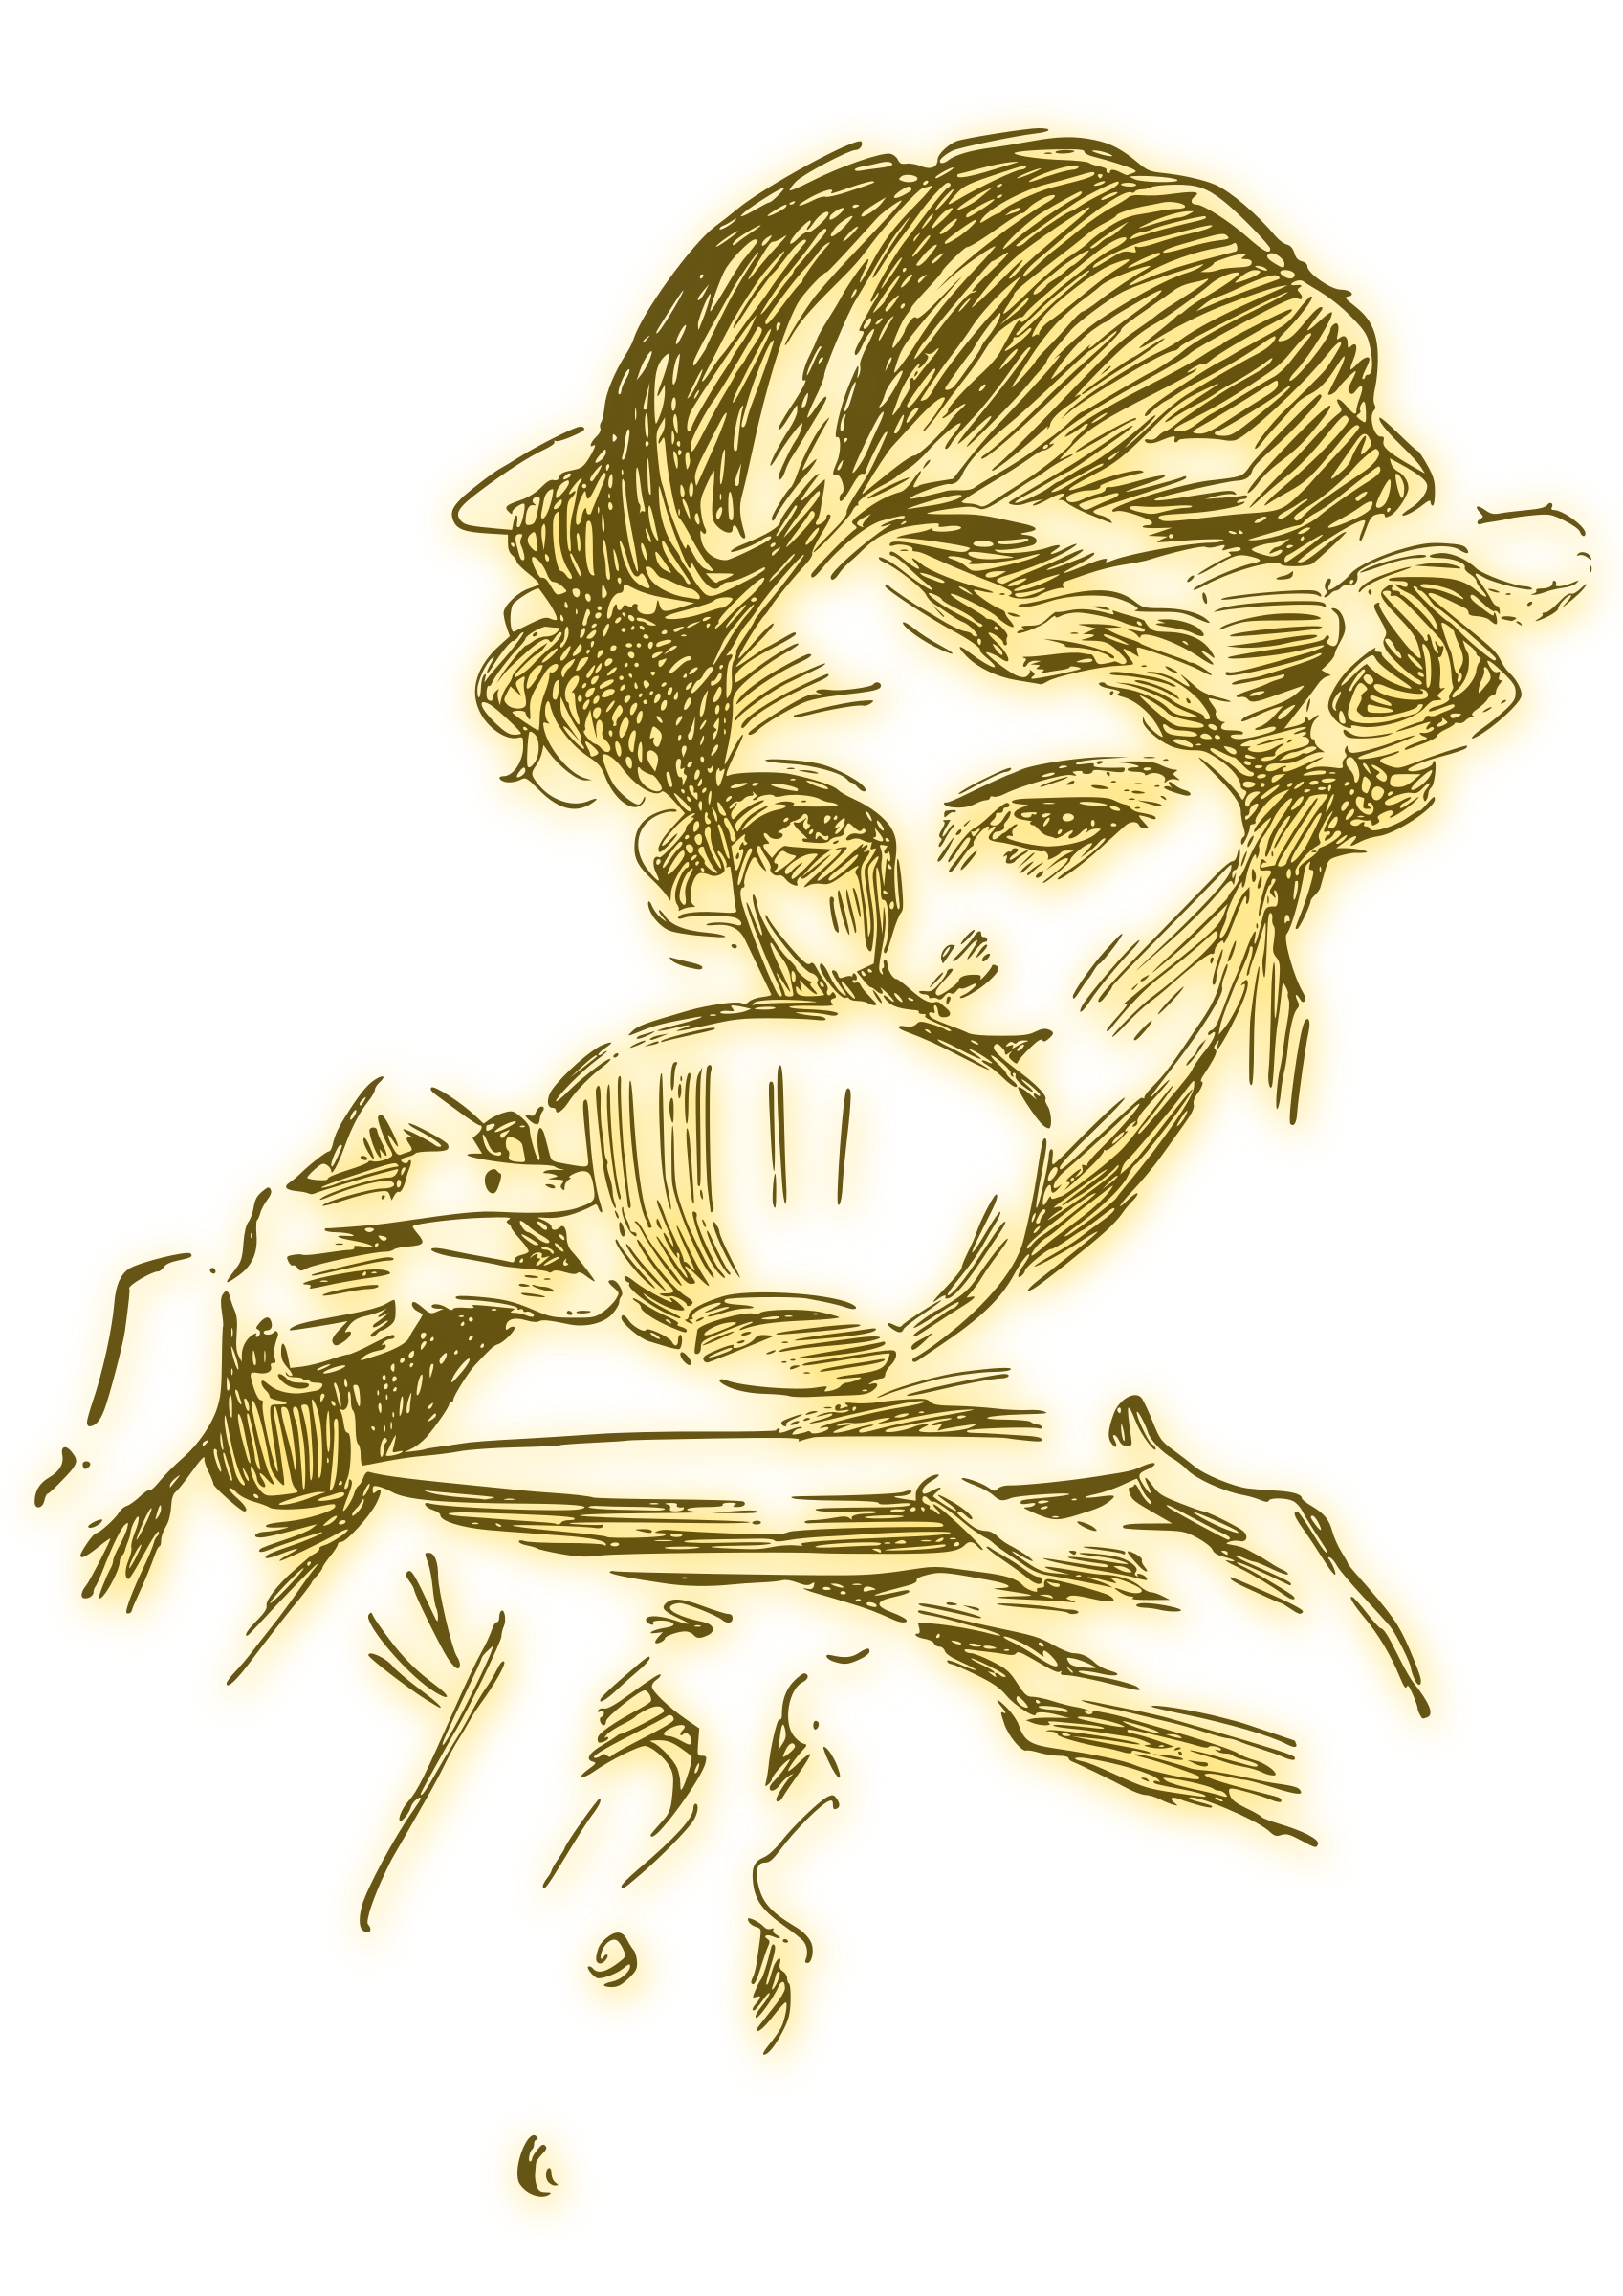 Woman Drinking Coffee Or Tea 04 Blur Clip Art Vintage Tea Cup Drawing Clip Art